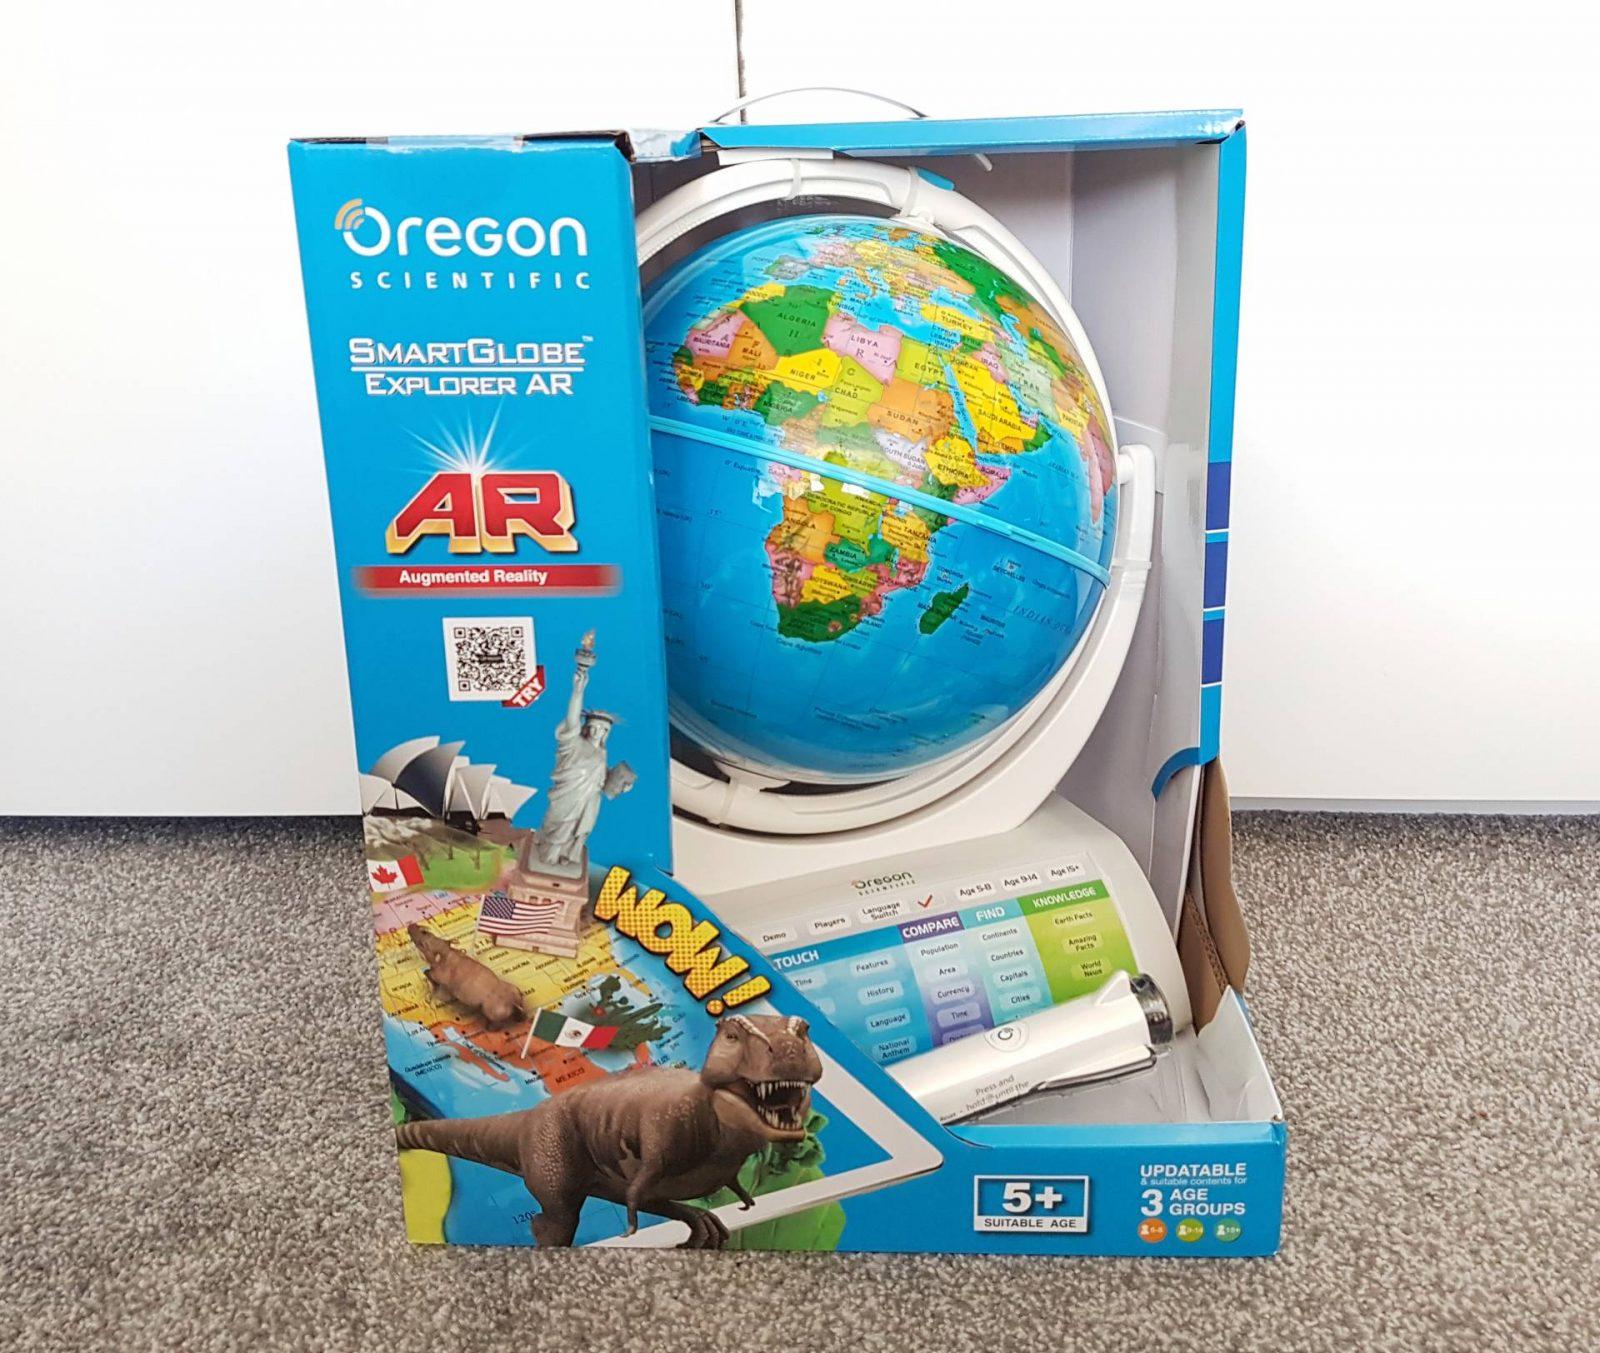 Oregon Scientific Smart Globe Explorer AR Review